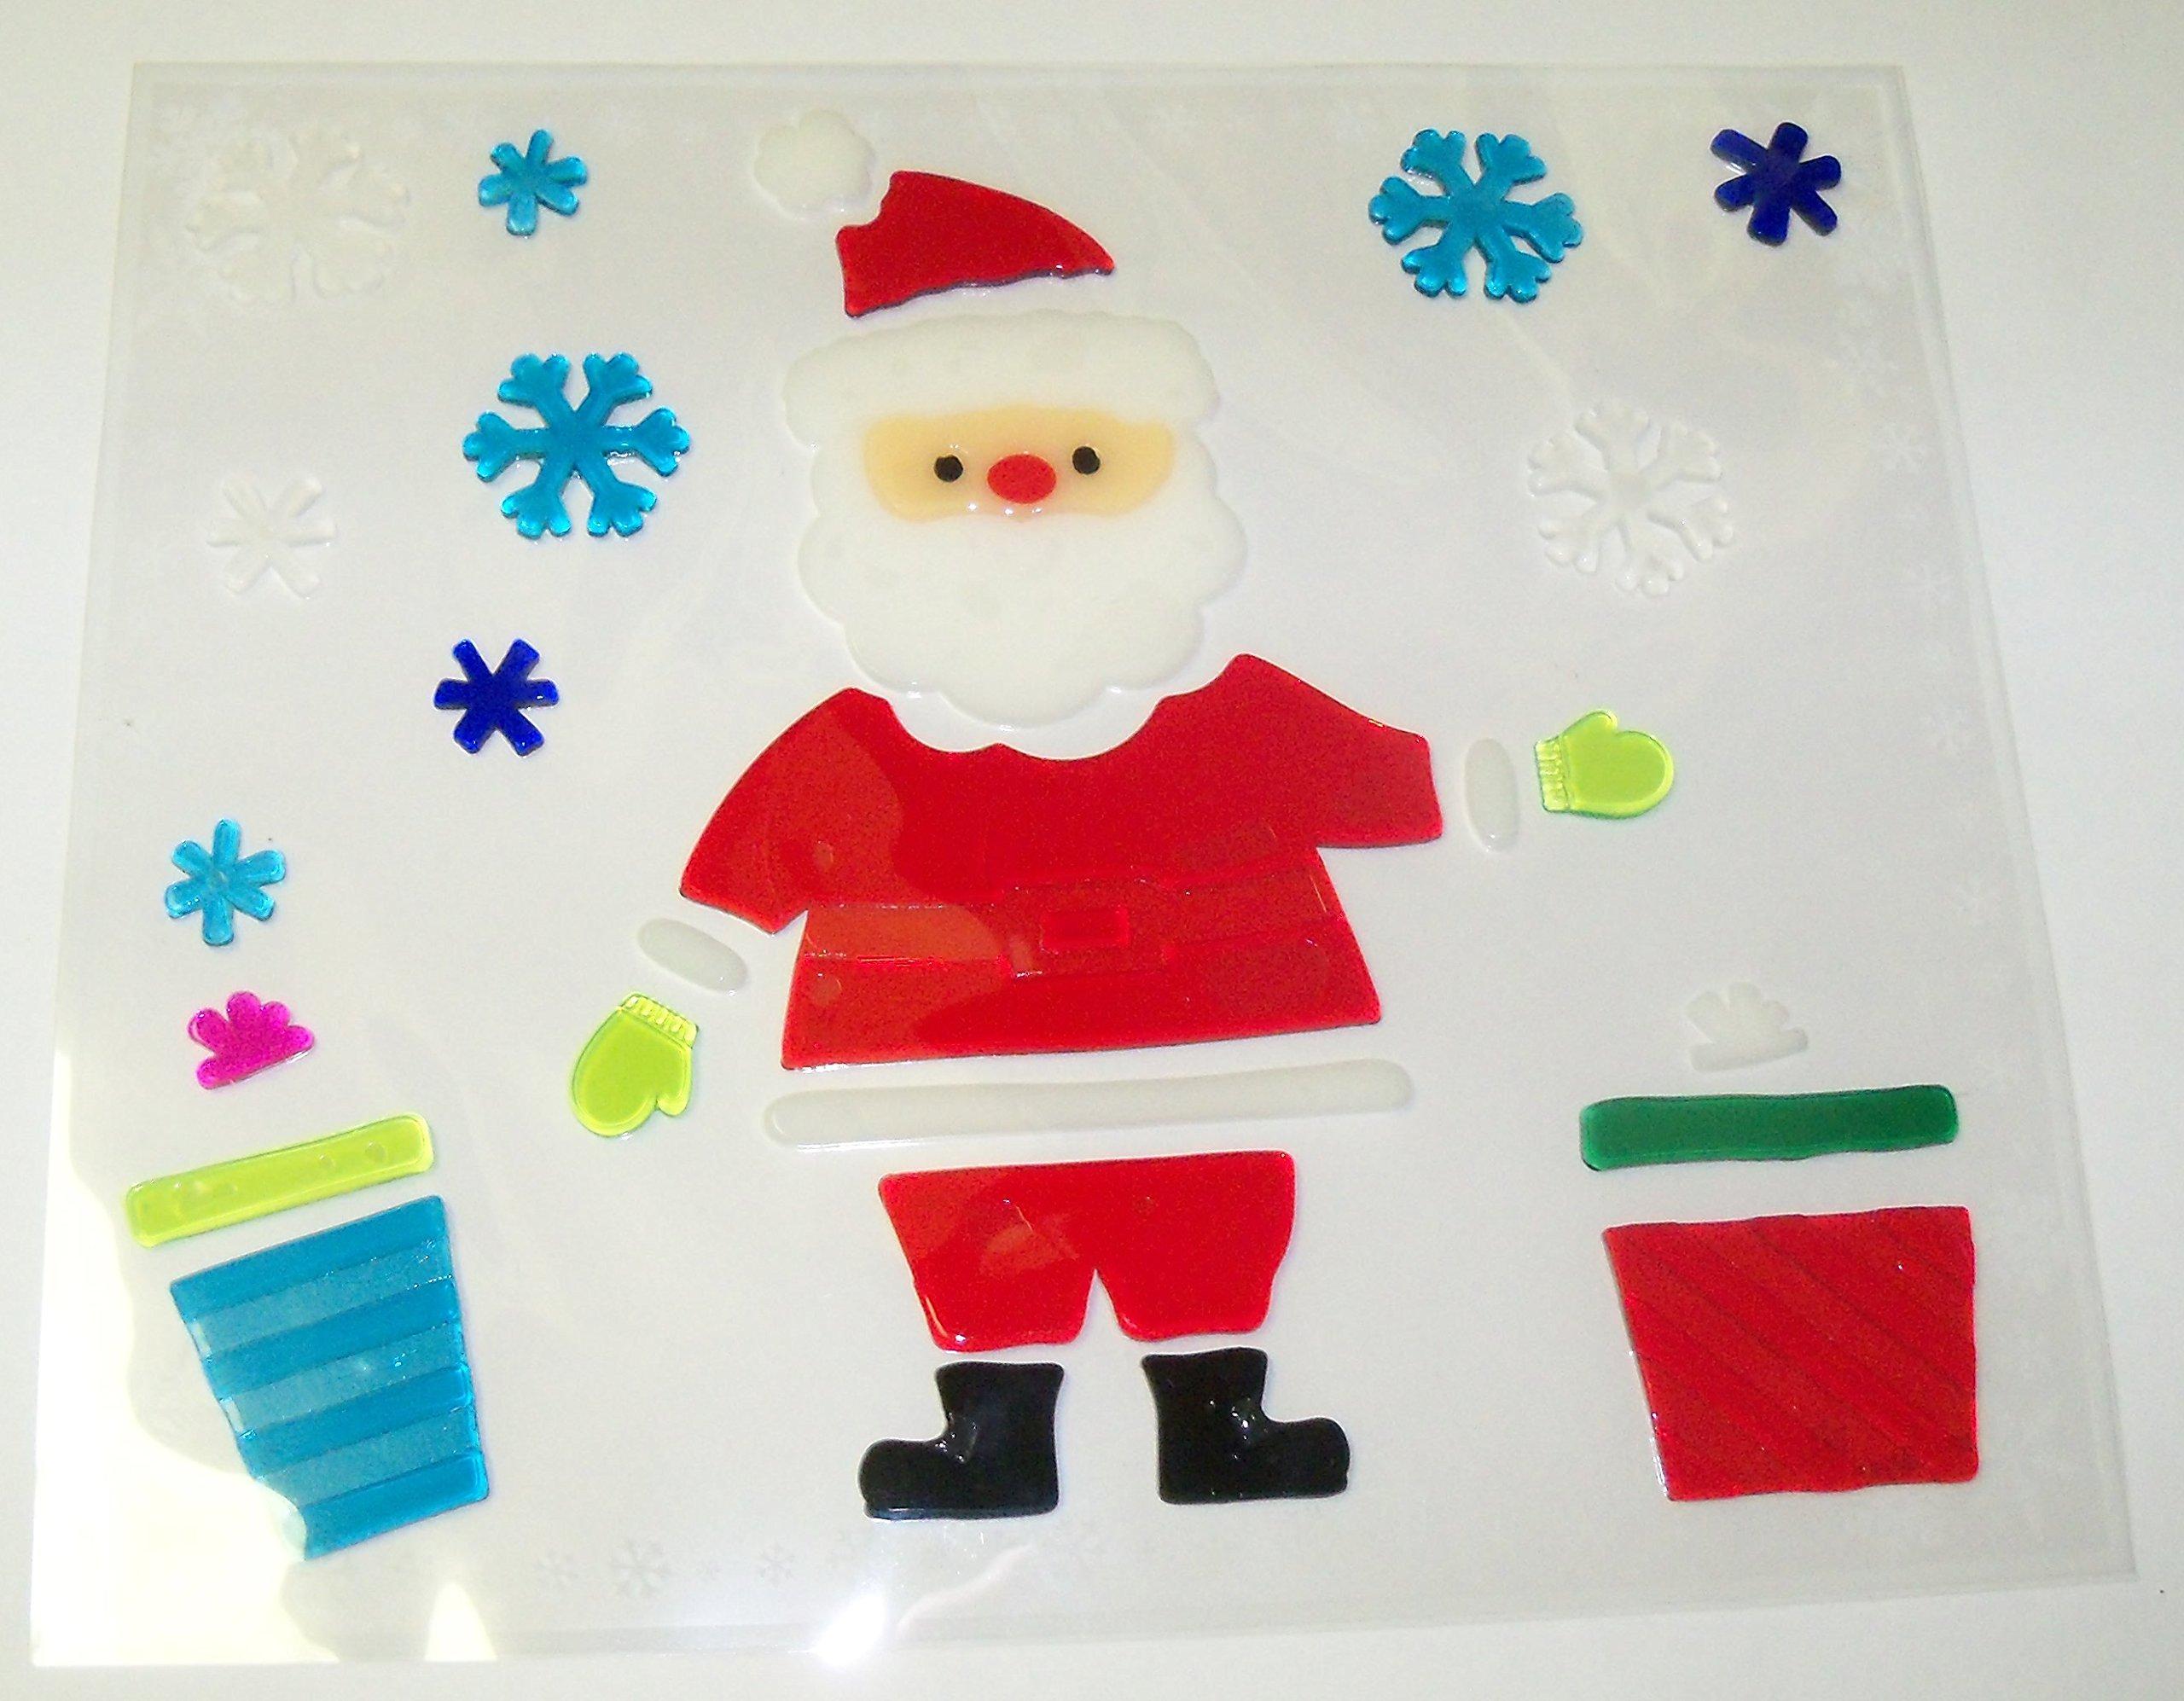 Impact Innovations Christmas Reusable Gel Window Clings ~ Santa, Presents, Multicolored Snowflakes (27 Clings, 1 Sheet)